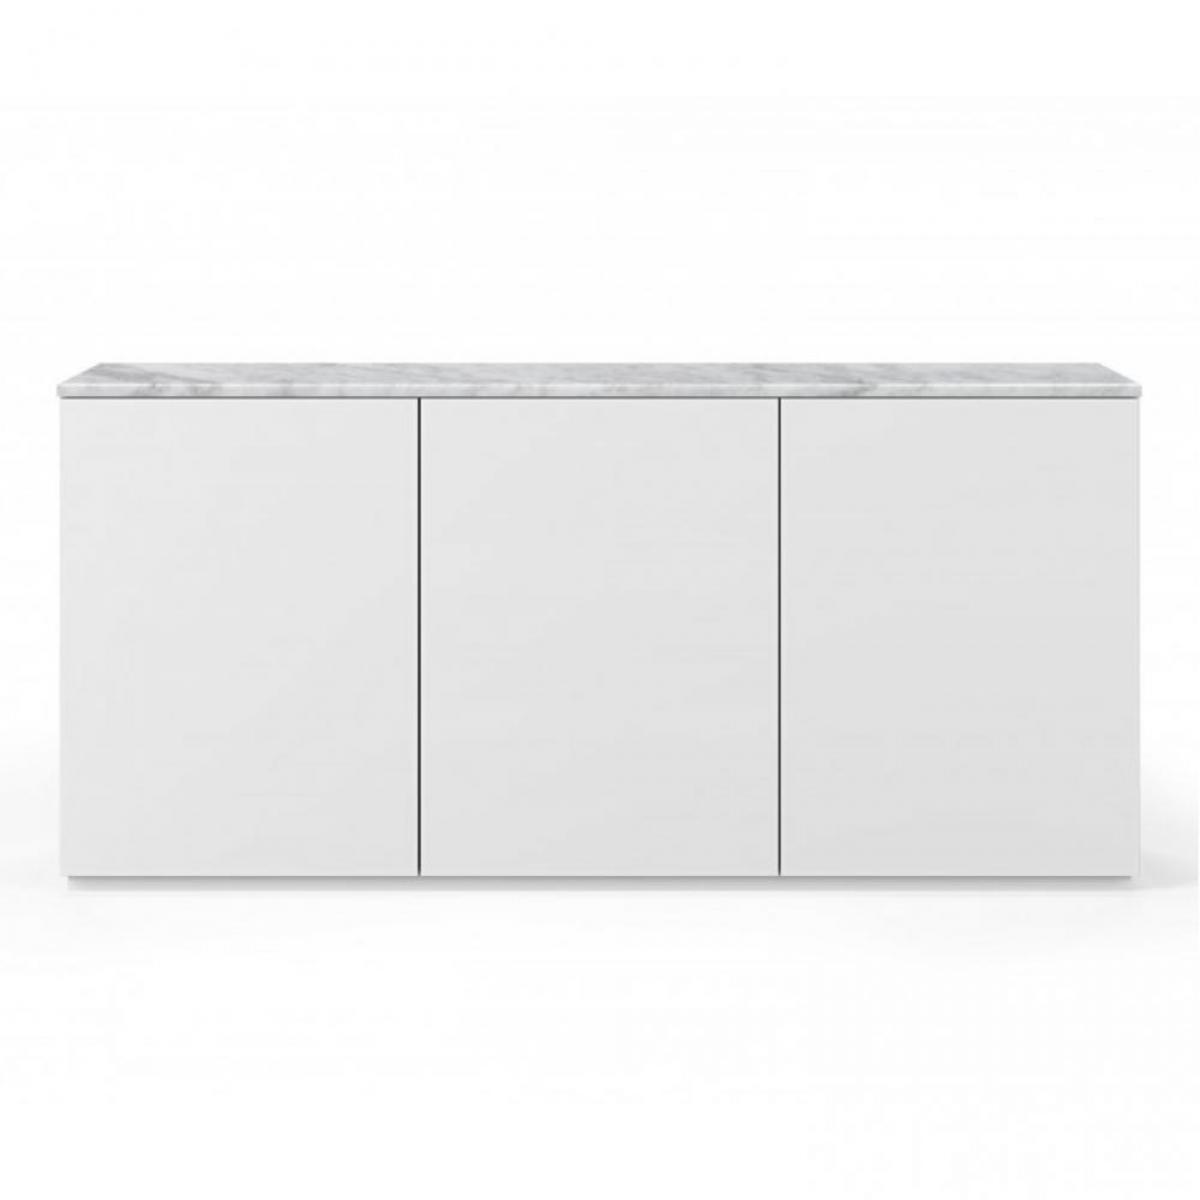 Inside 75 Buffet WHITY blanc mat 180cm 3 portes Plateau en Marbre blanc